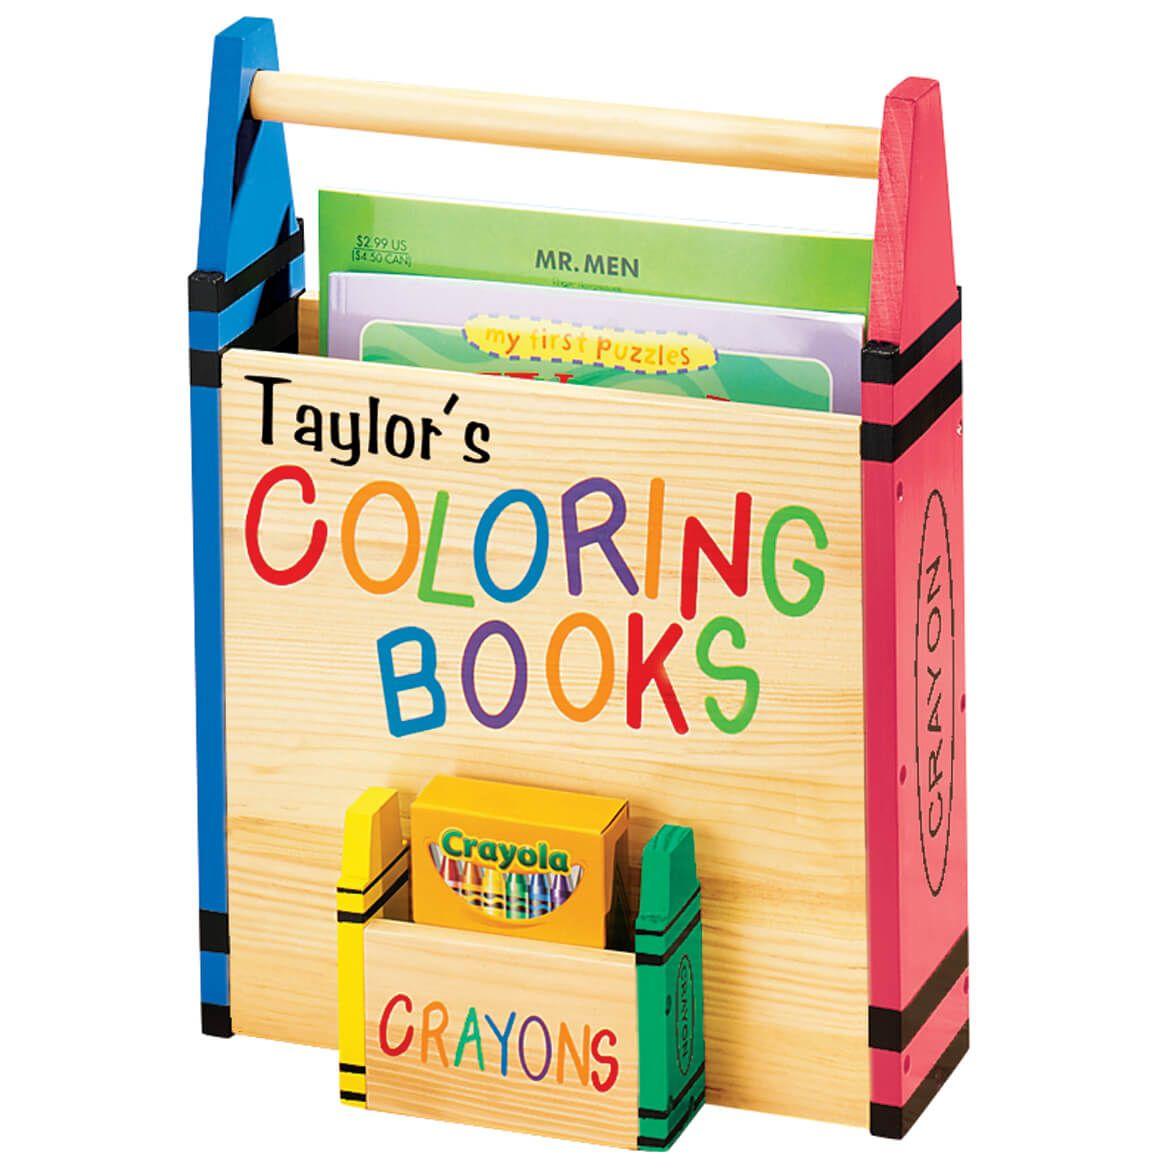 Personalized Wood Color Crayon Caddy Crayon Organizer Coloring Book Storage Personalized Coloring Book Crayon Storage